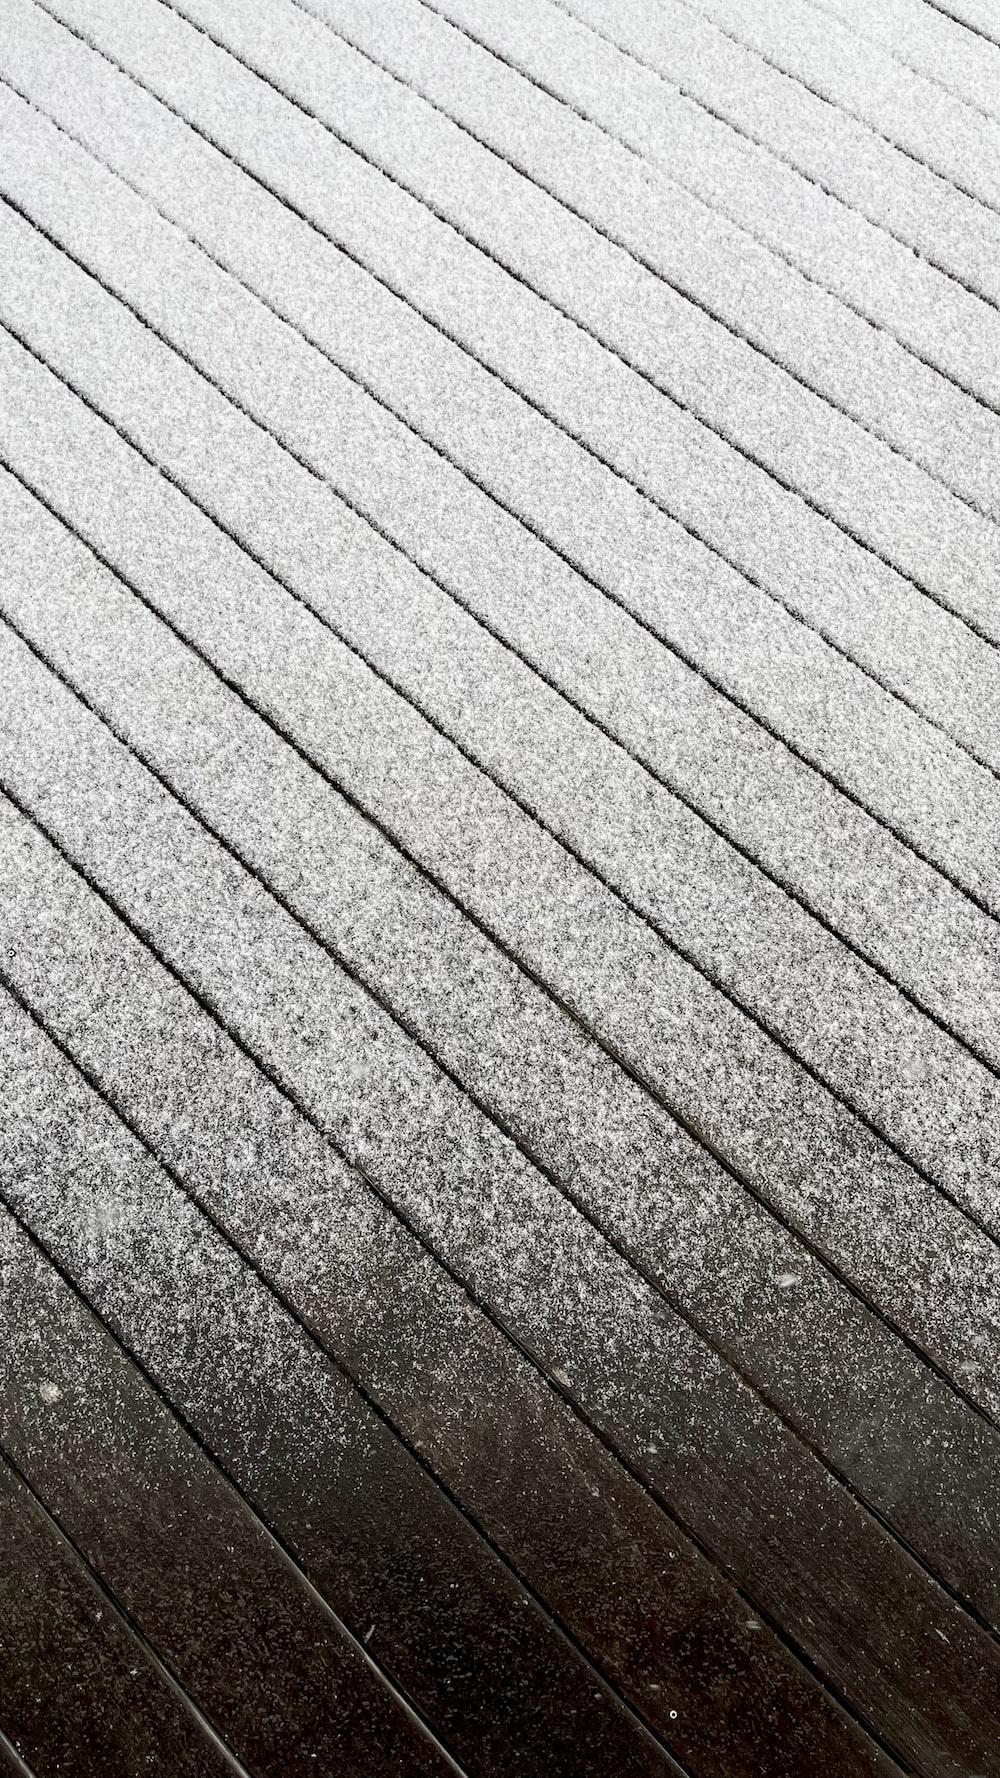 gray and white concrete pavement